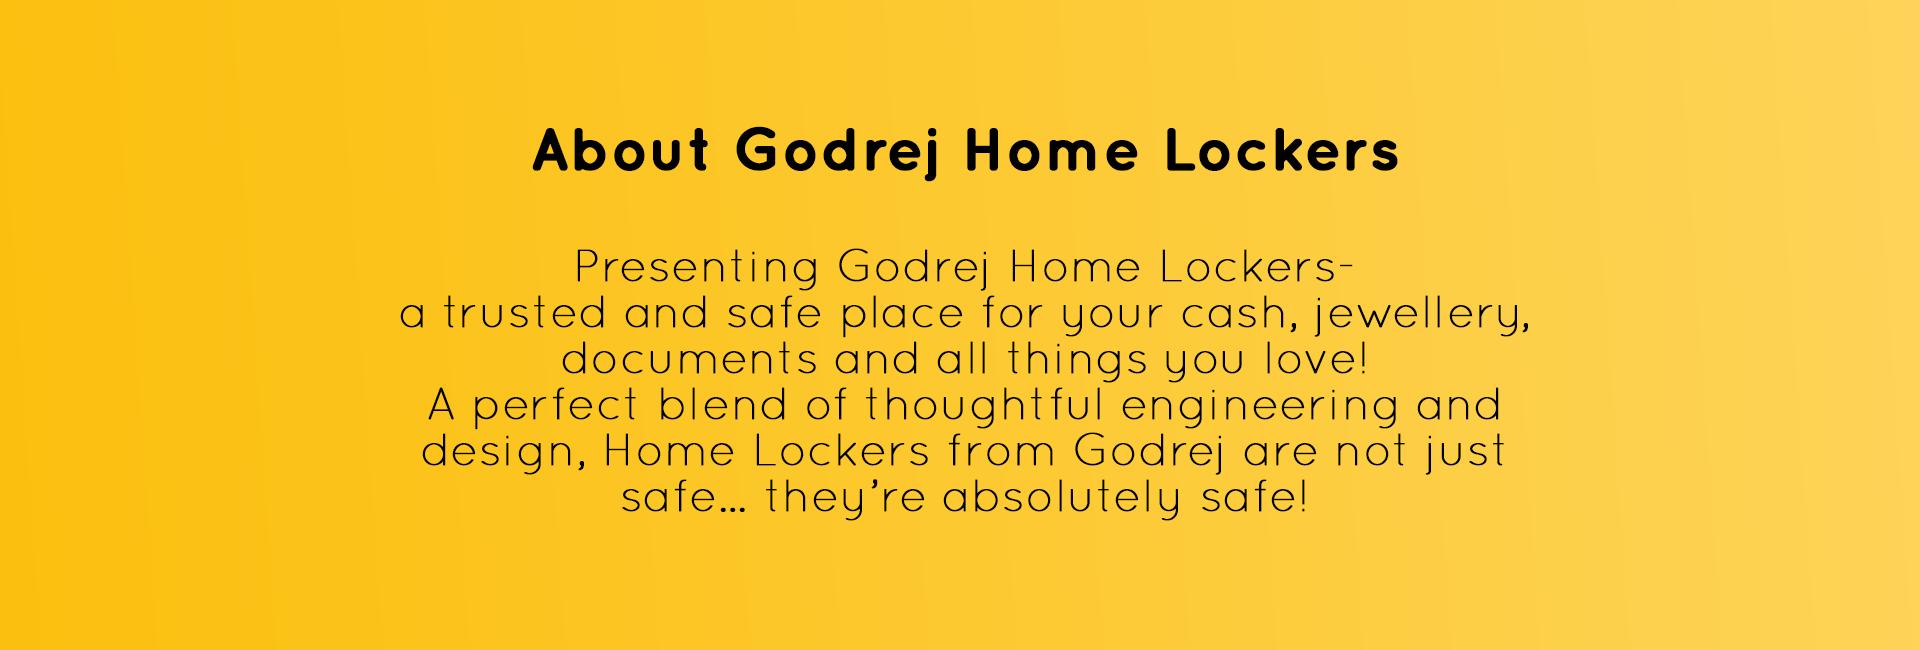 Godrej Home Lockers